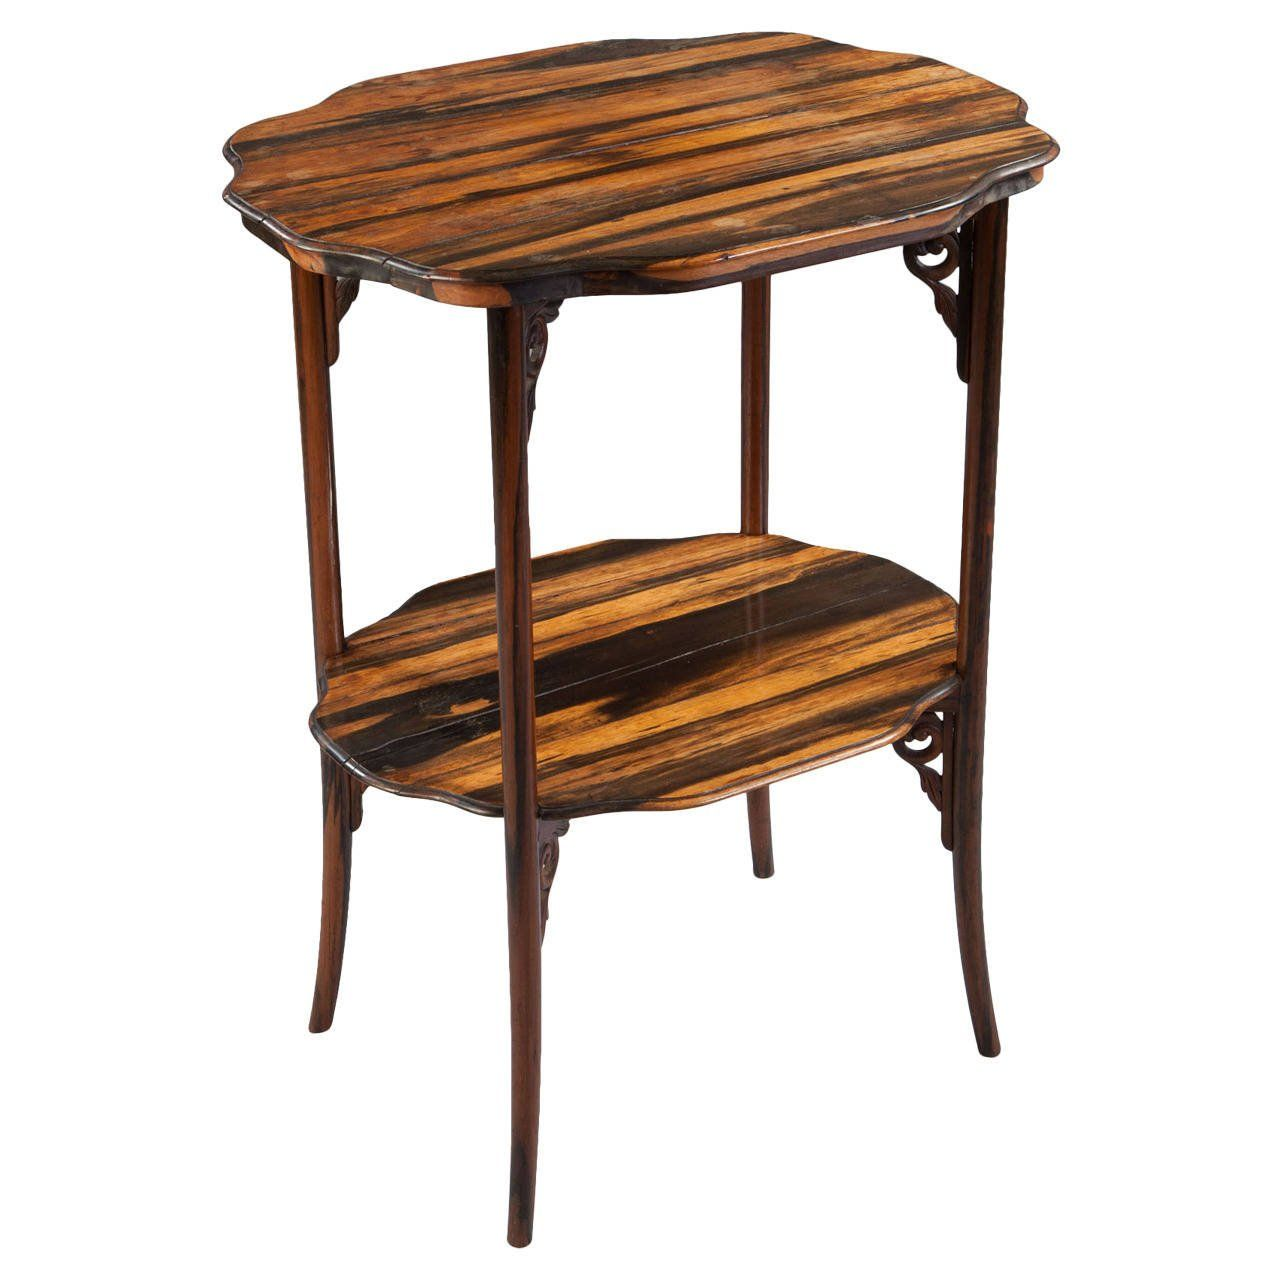 Calamander Wood Folding Campaign Table